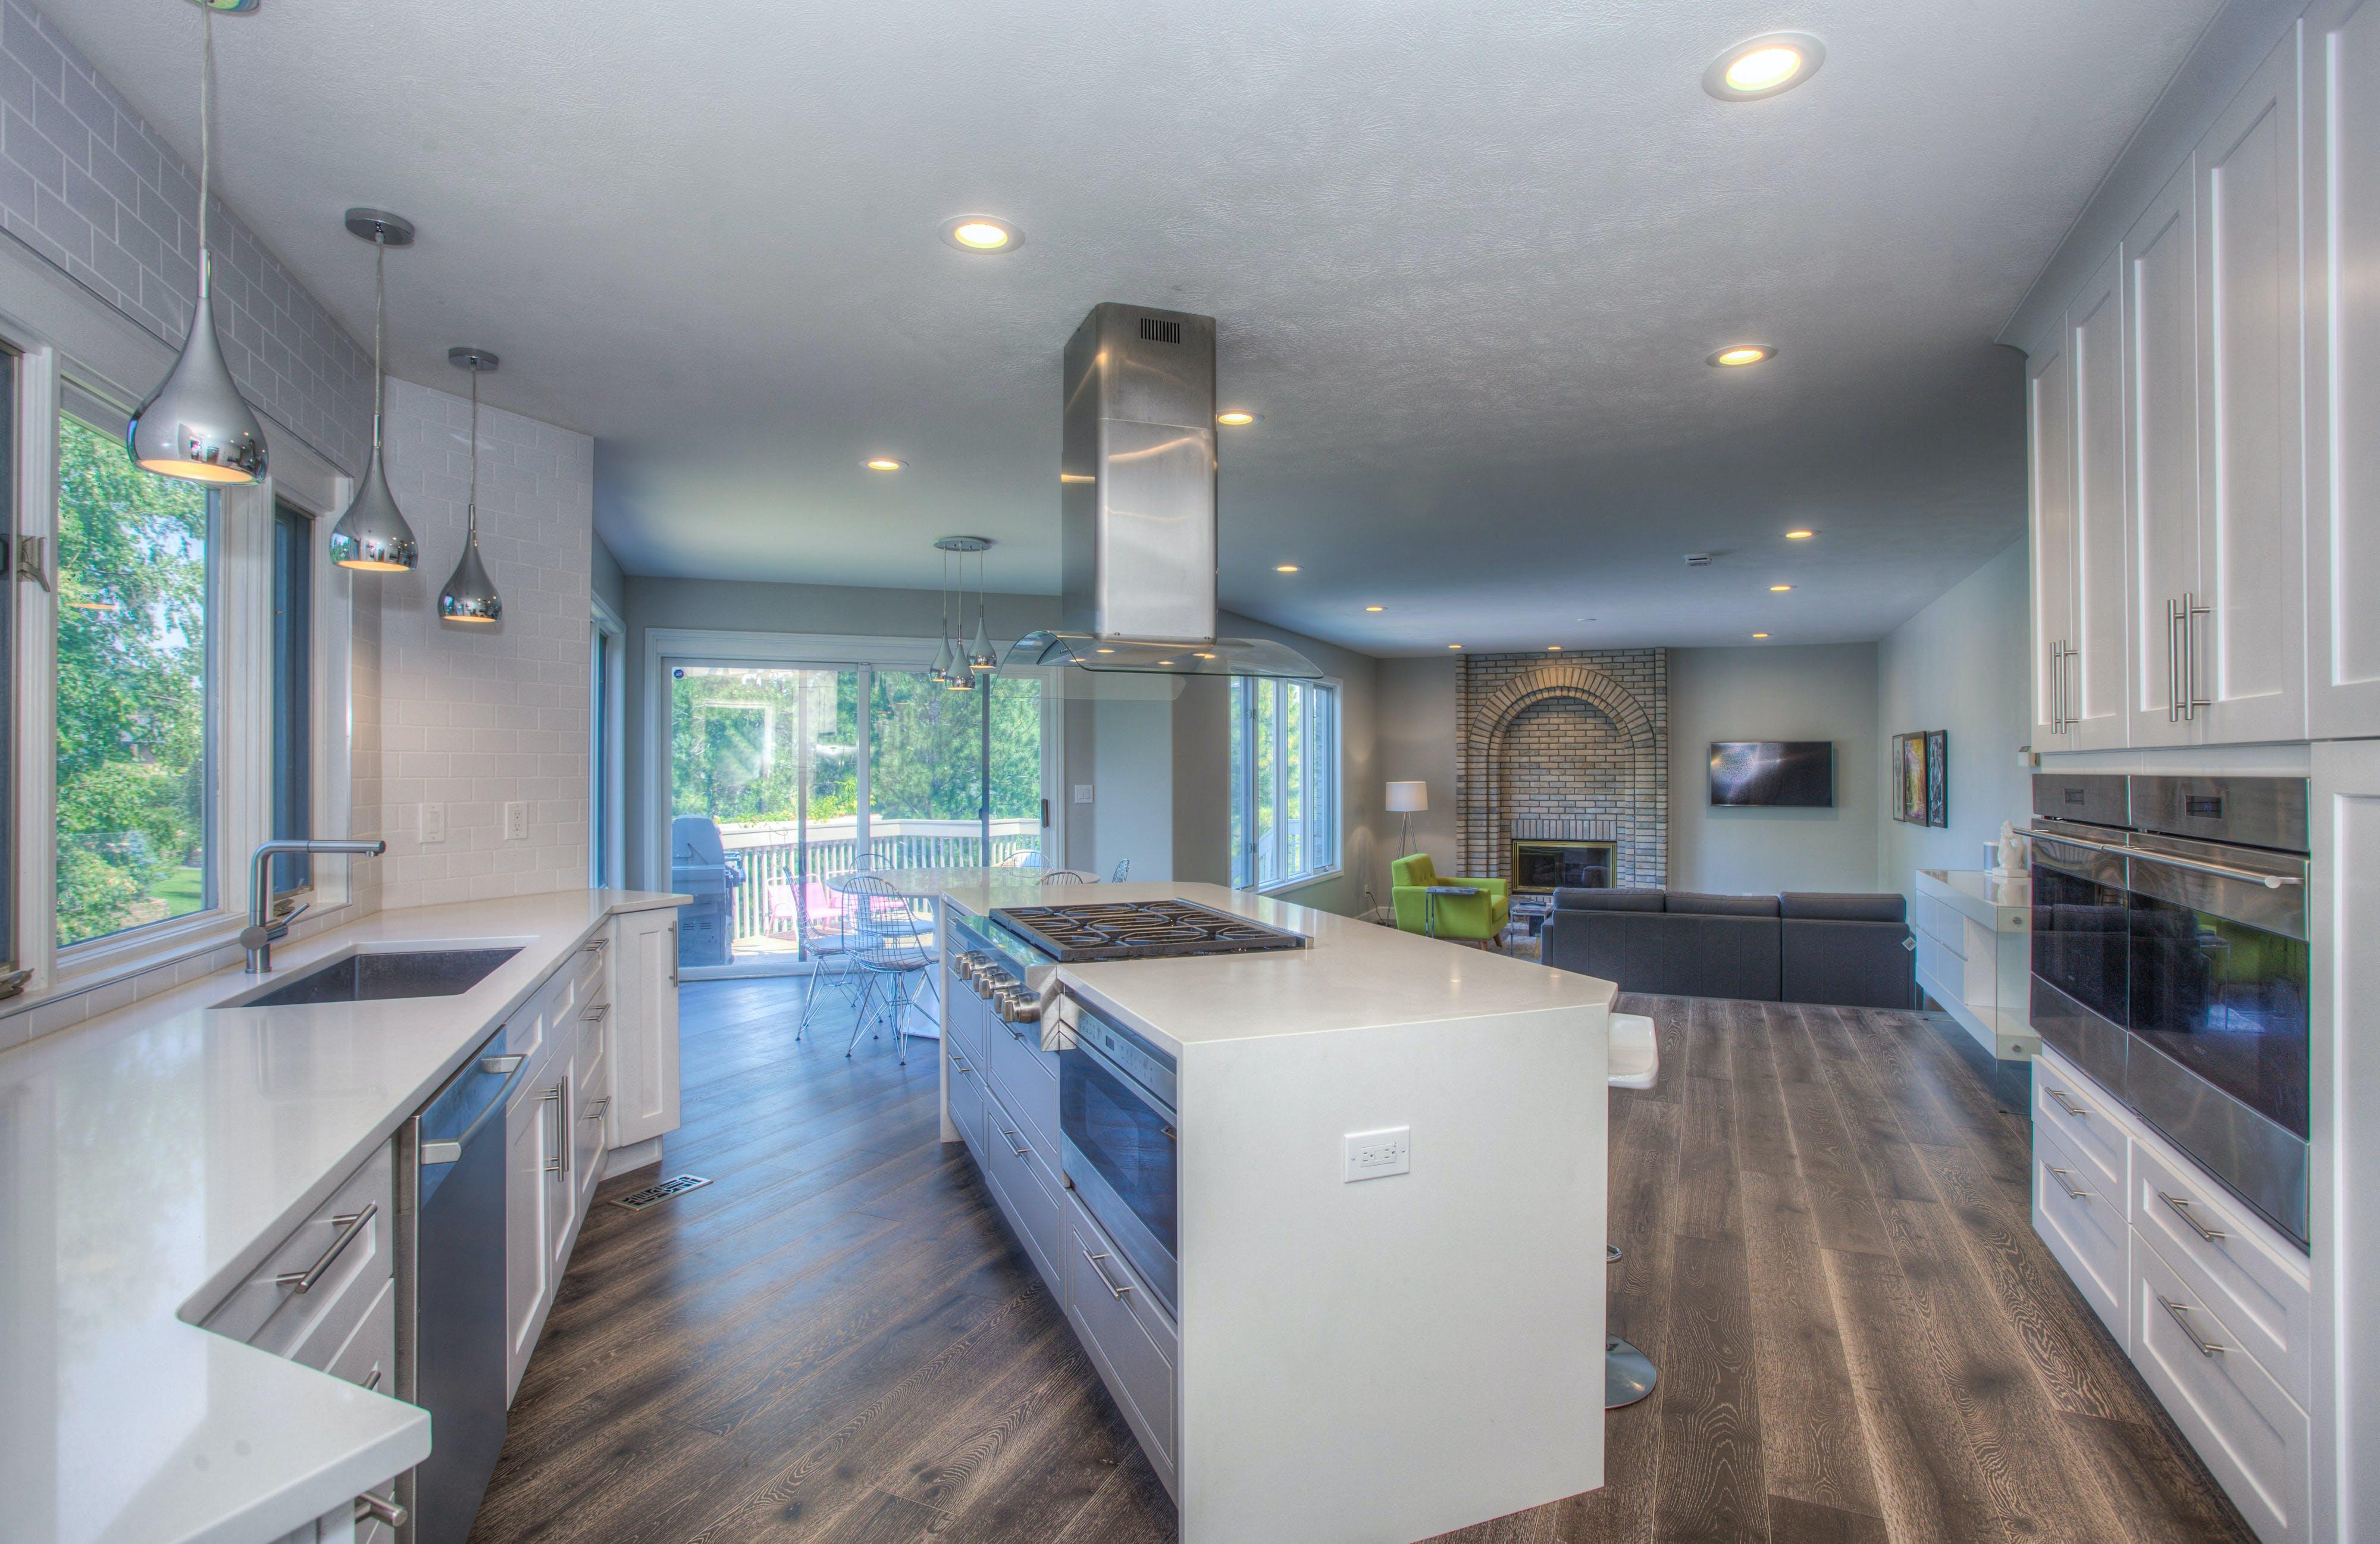 Free stock photo of cabinet, cozy home, hardwood floor, home decor